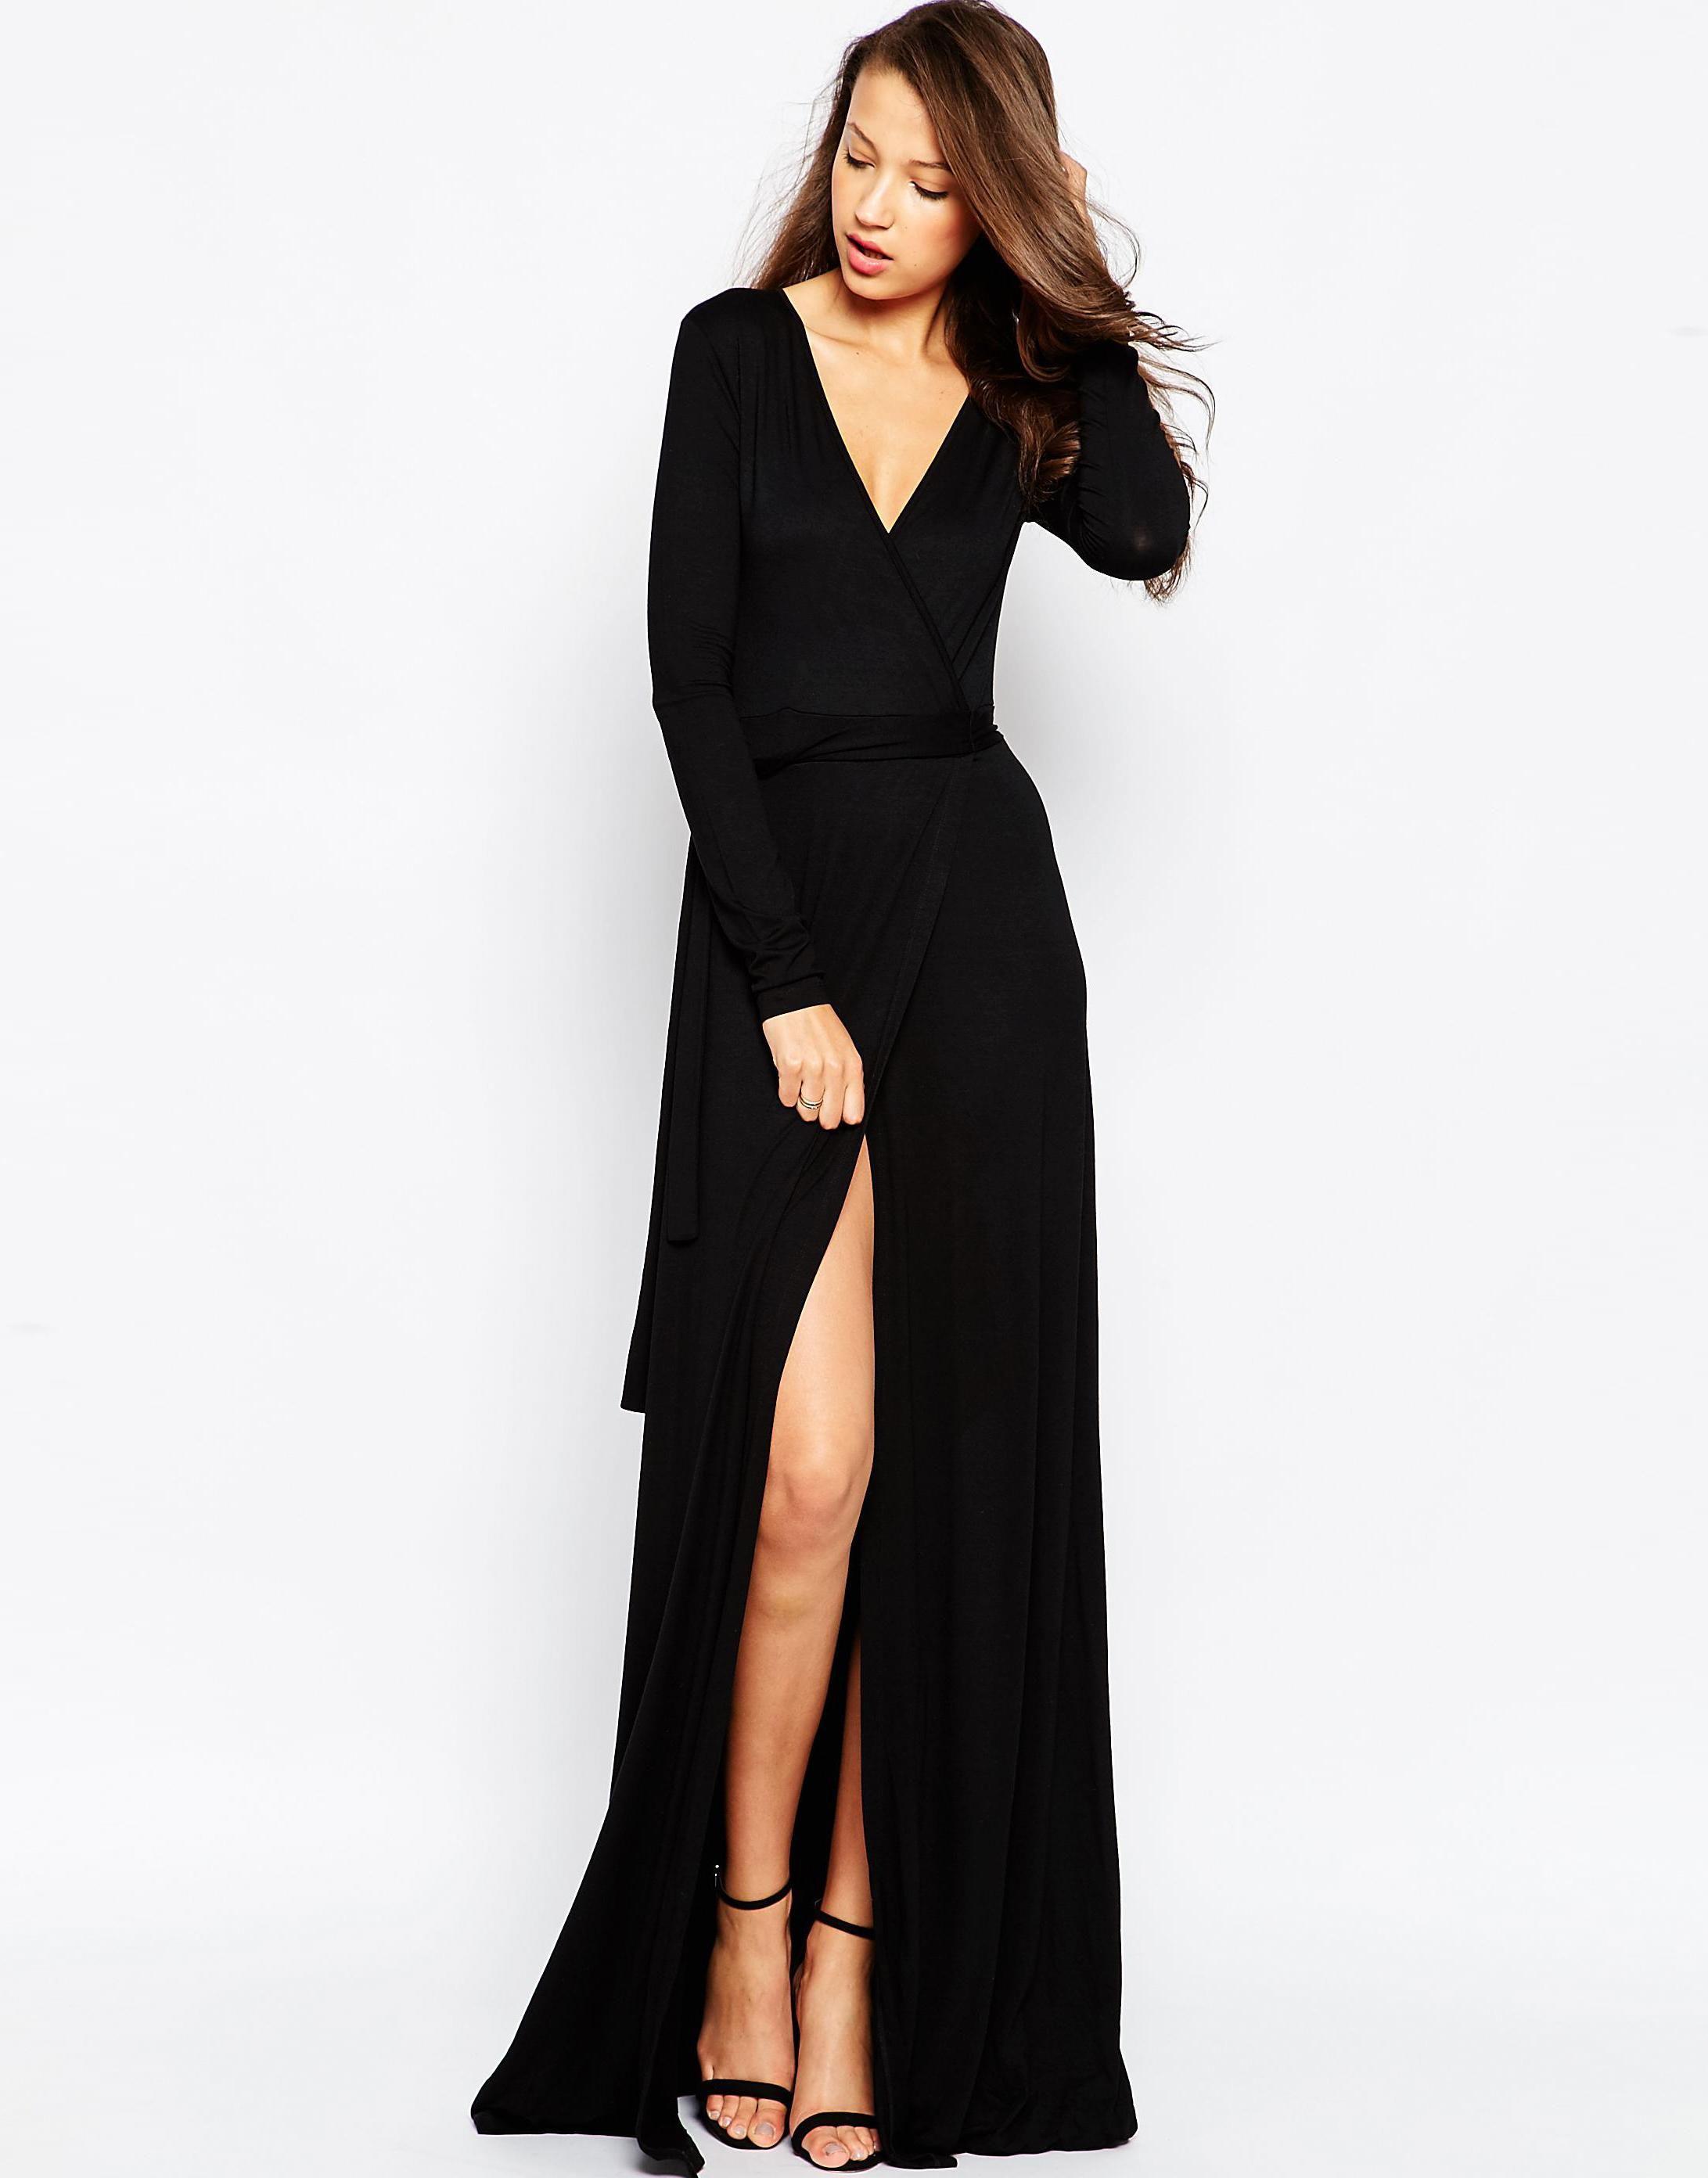 Us Asos Com Taller Than Your Average Ttya Thigh Split Wrap Maxi Dress Candice Blackburn 5655906 Black Maxi Dress Maxi Wrap Dress Dresses [ 2784 x 2183 Pixel ]